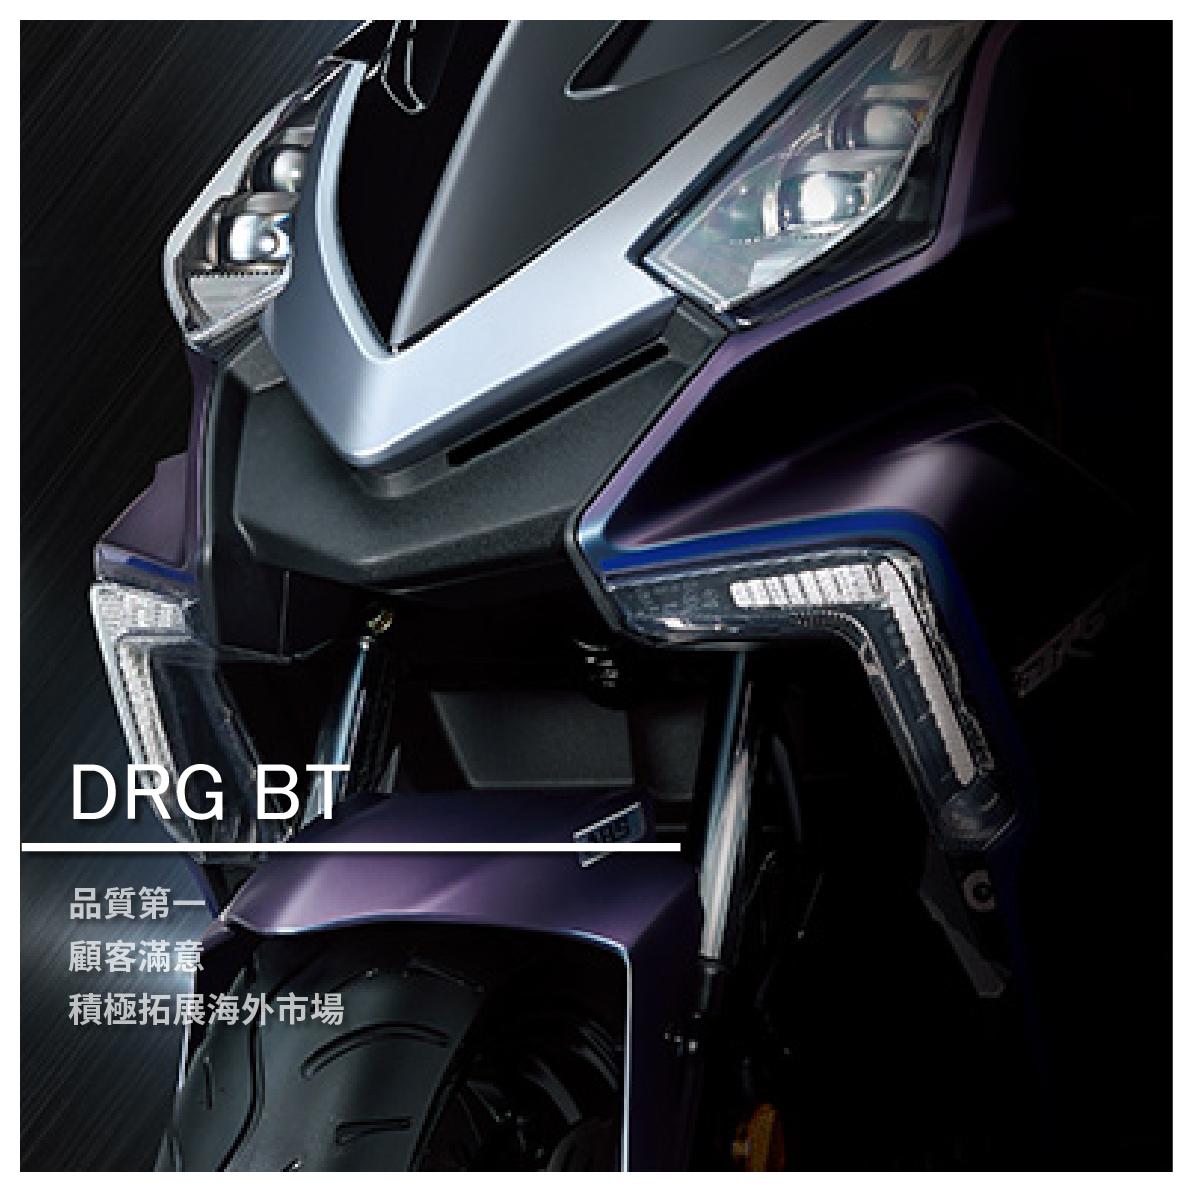 【鋐安車業】SYM 三陽系列 DRG BT